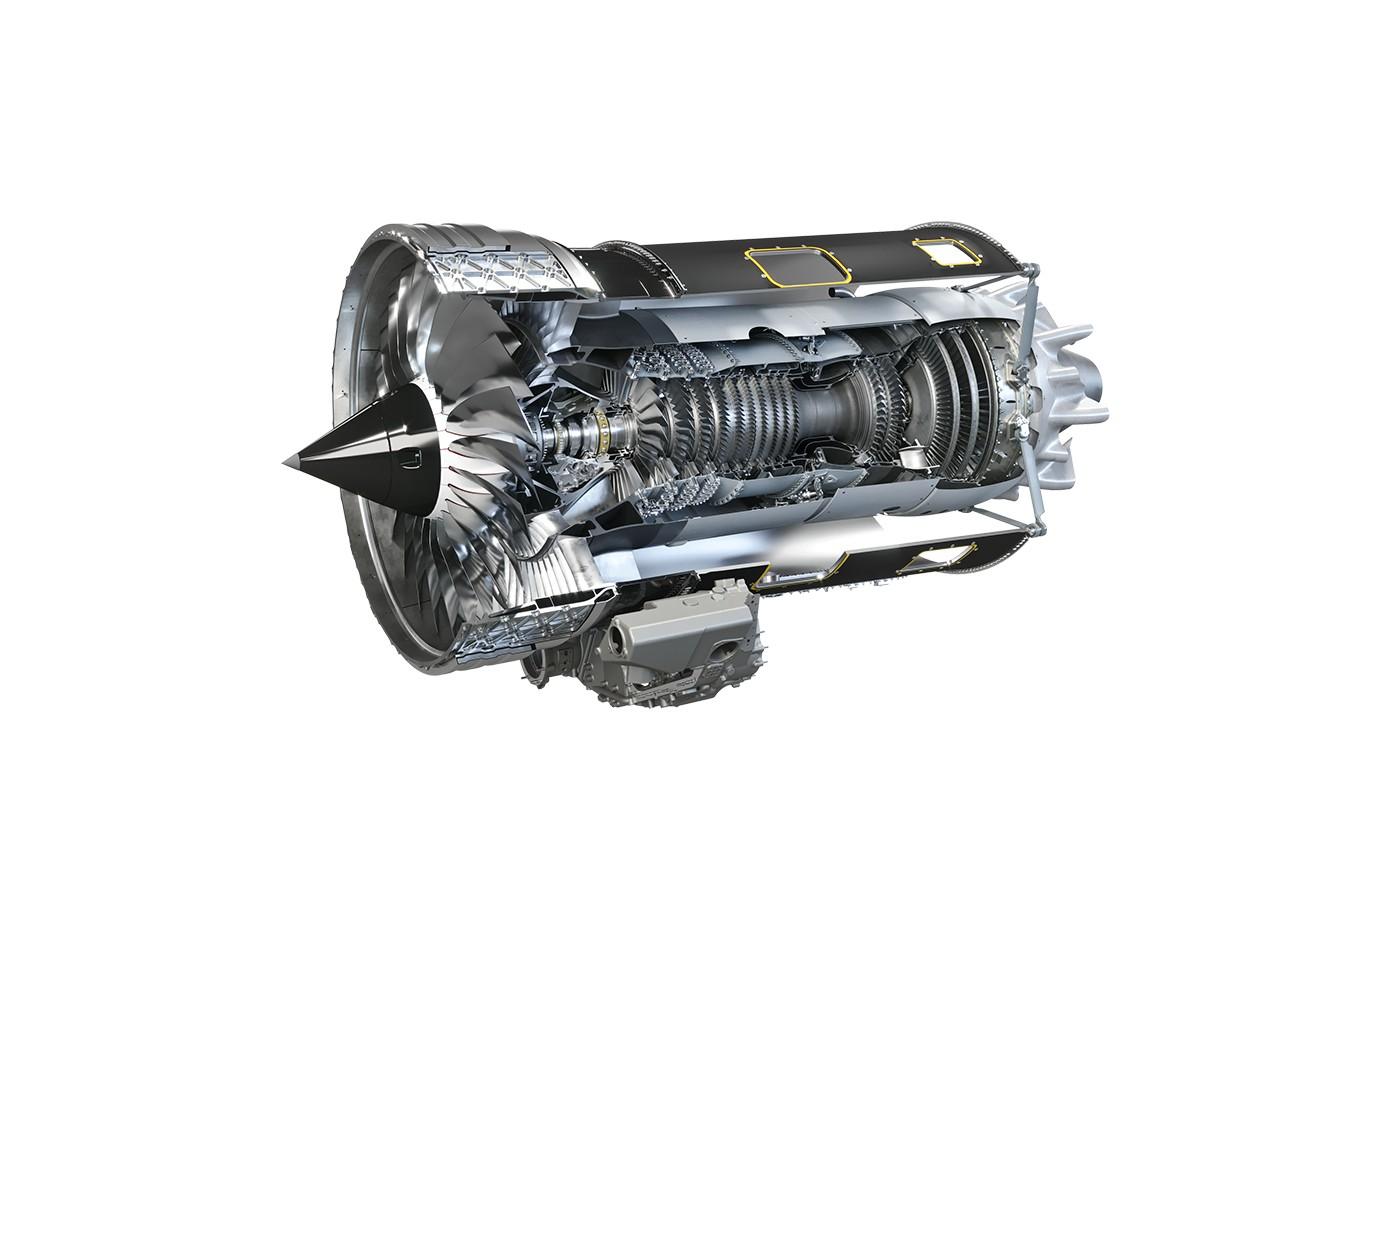 Rolls-Royce Pearl engine